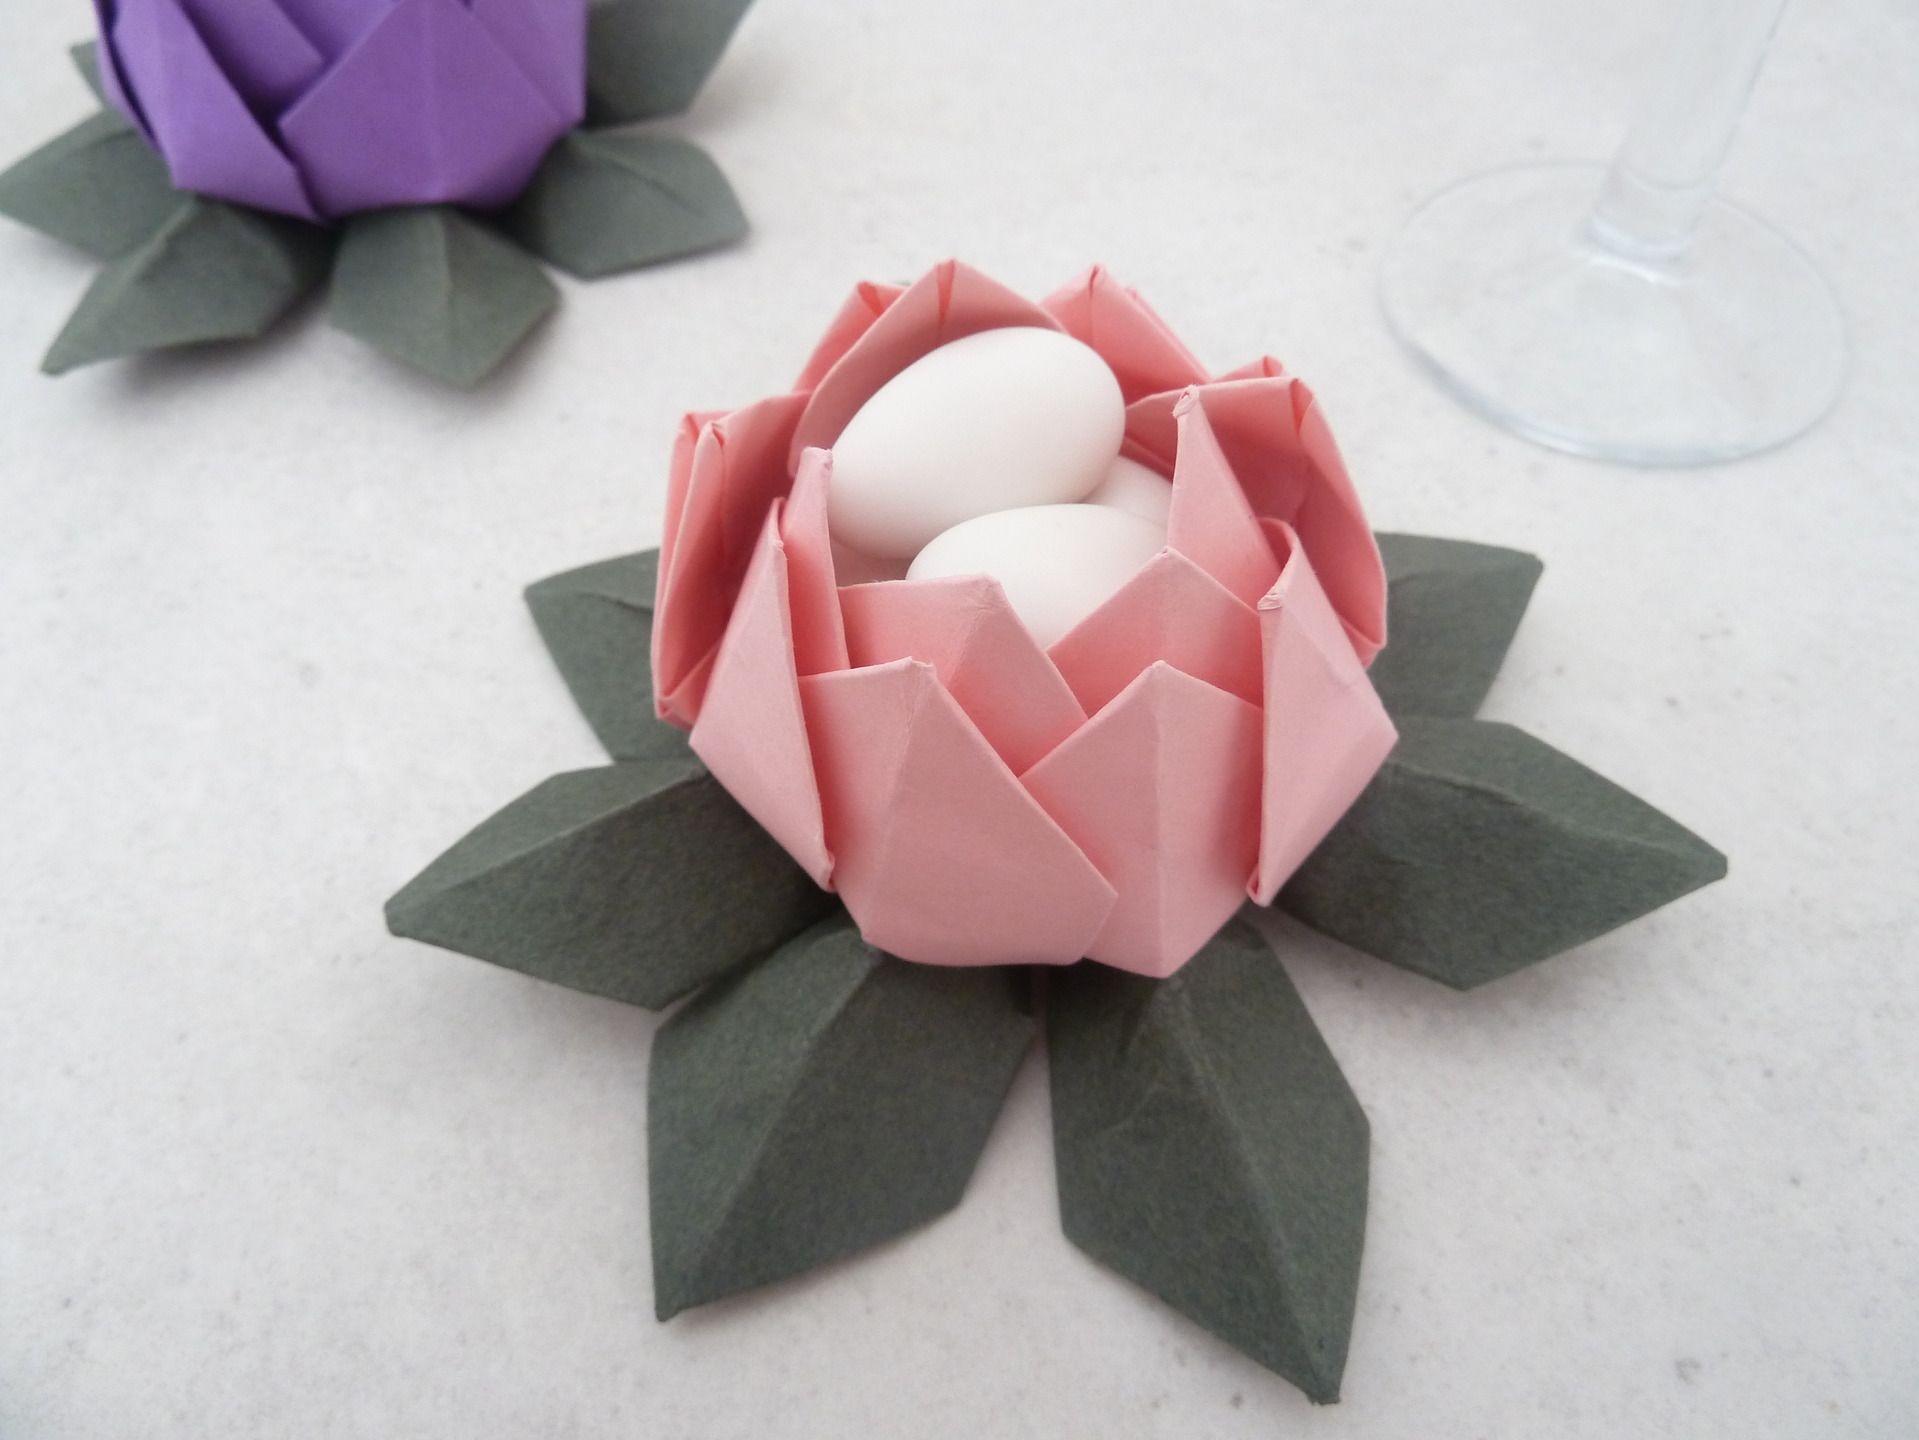 cadeau invit s contenant drag es fleur de lotus en. Black Bedroom Furniture Sets. Home Design Ideas